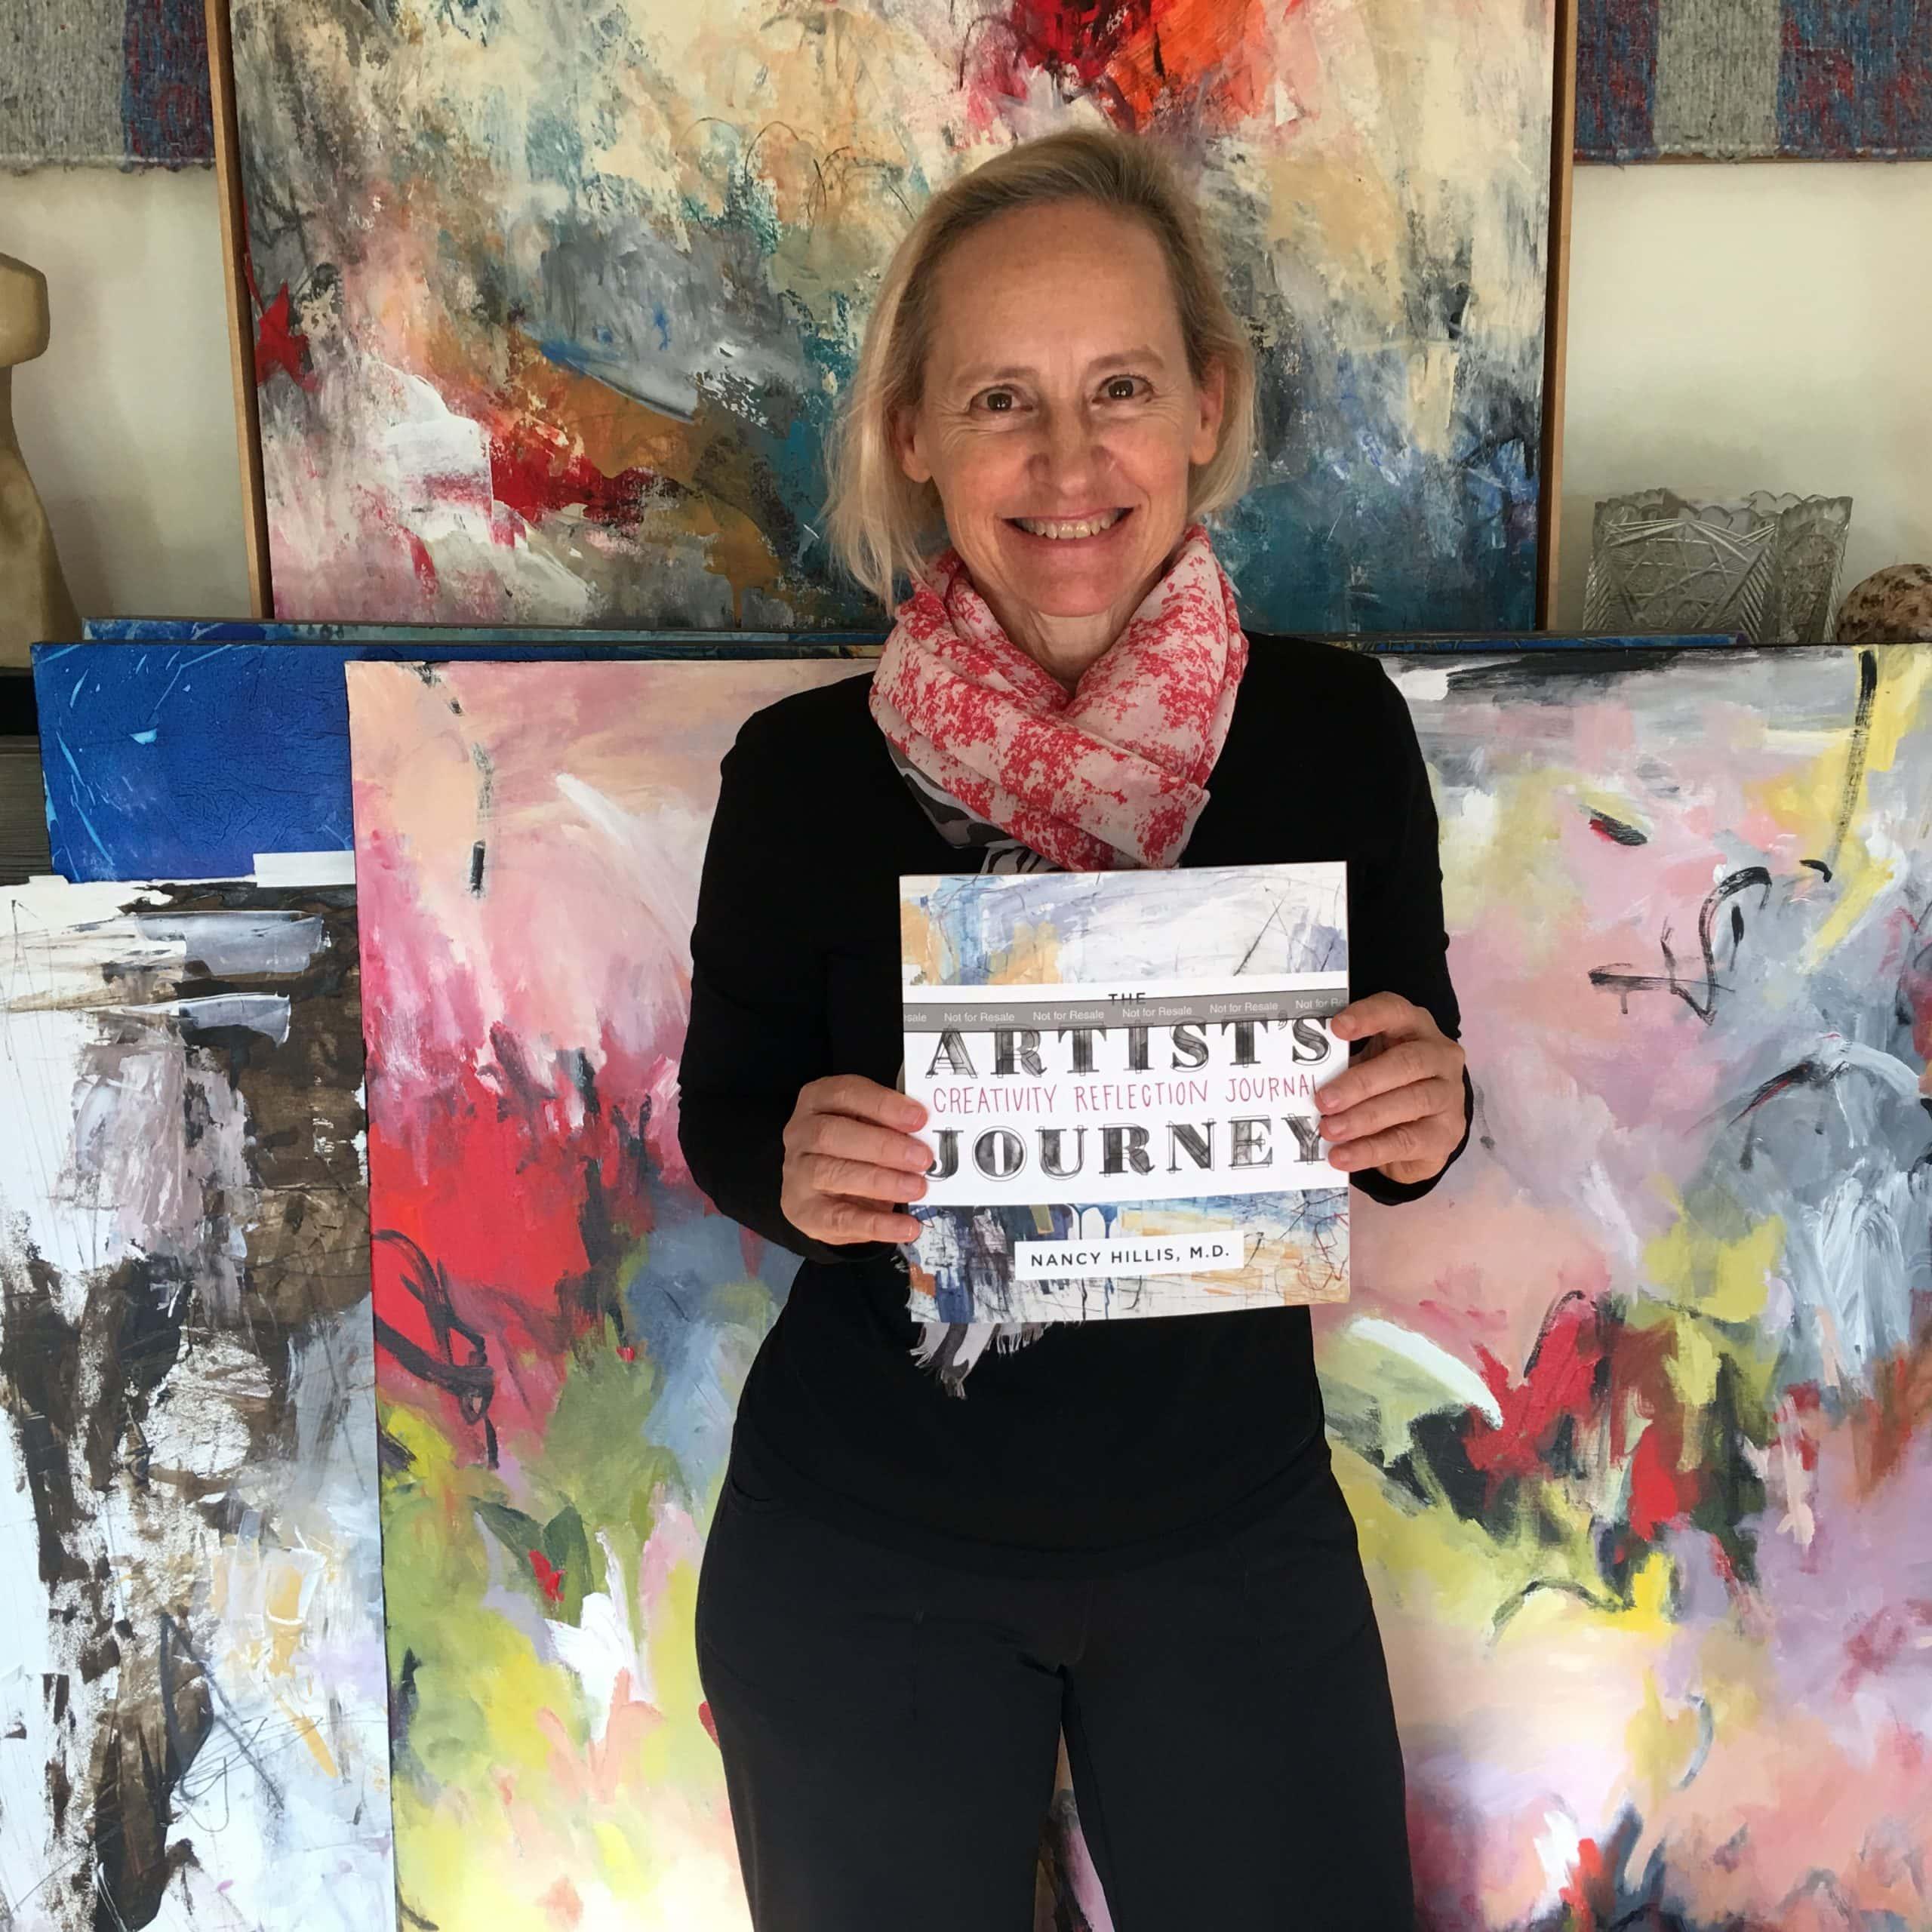 Nancy Hillis-The Artist's Journey Creativity Reflection Journall